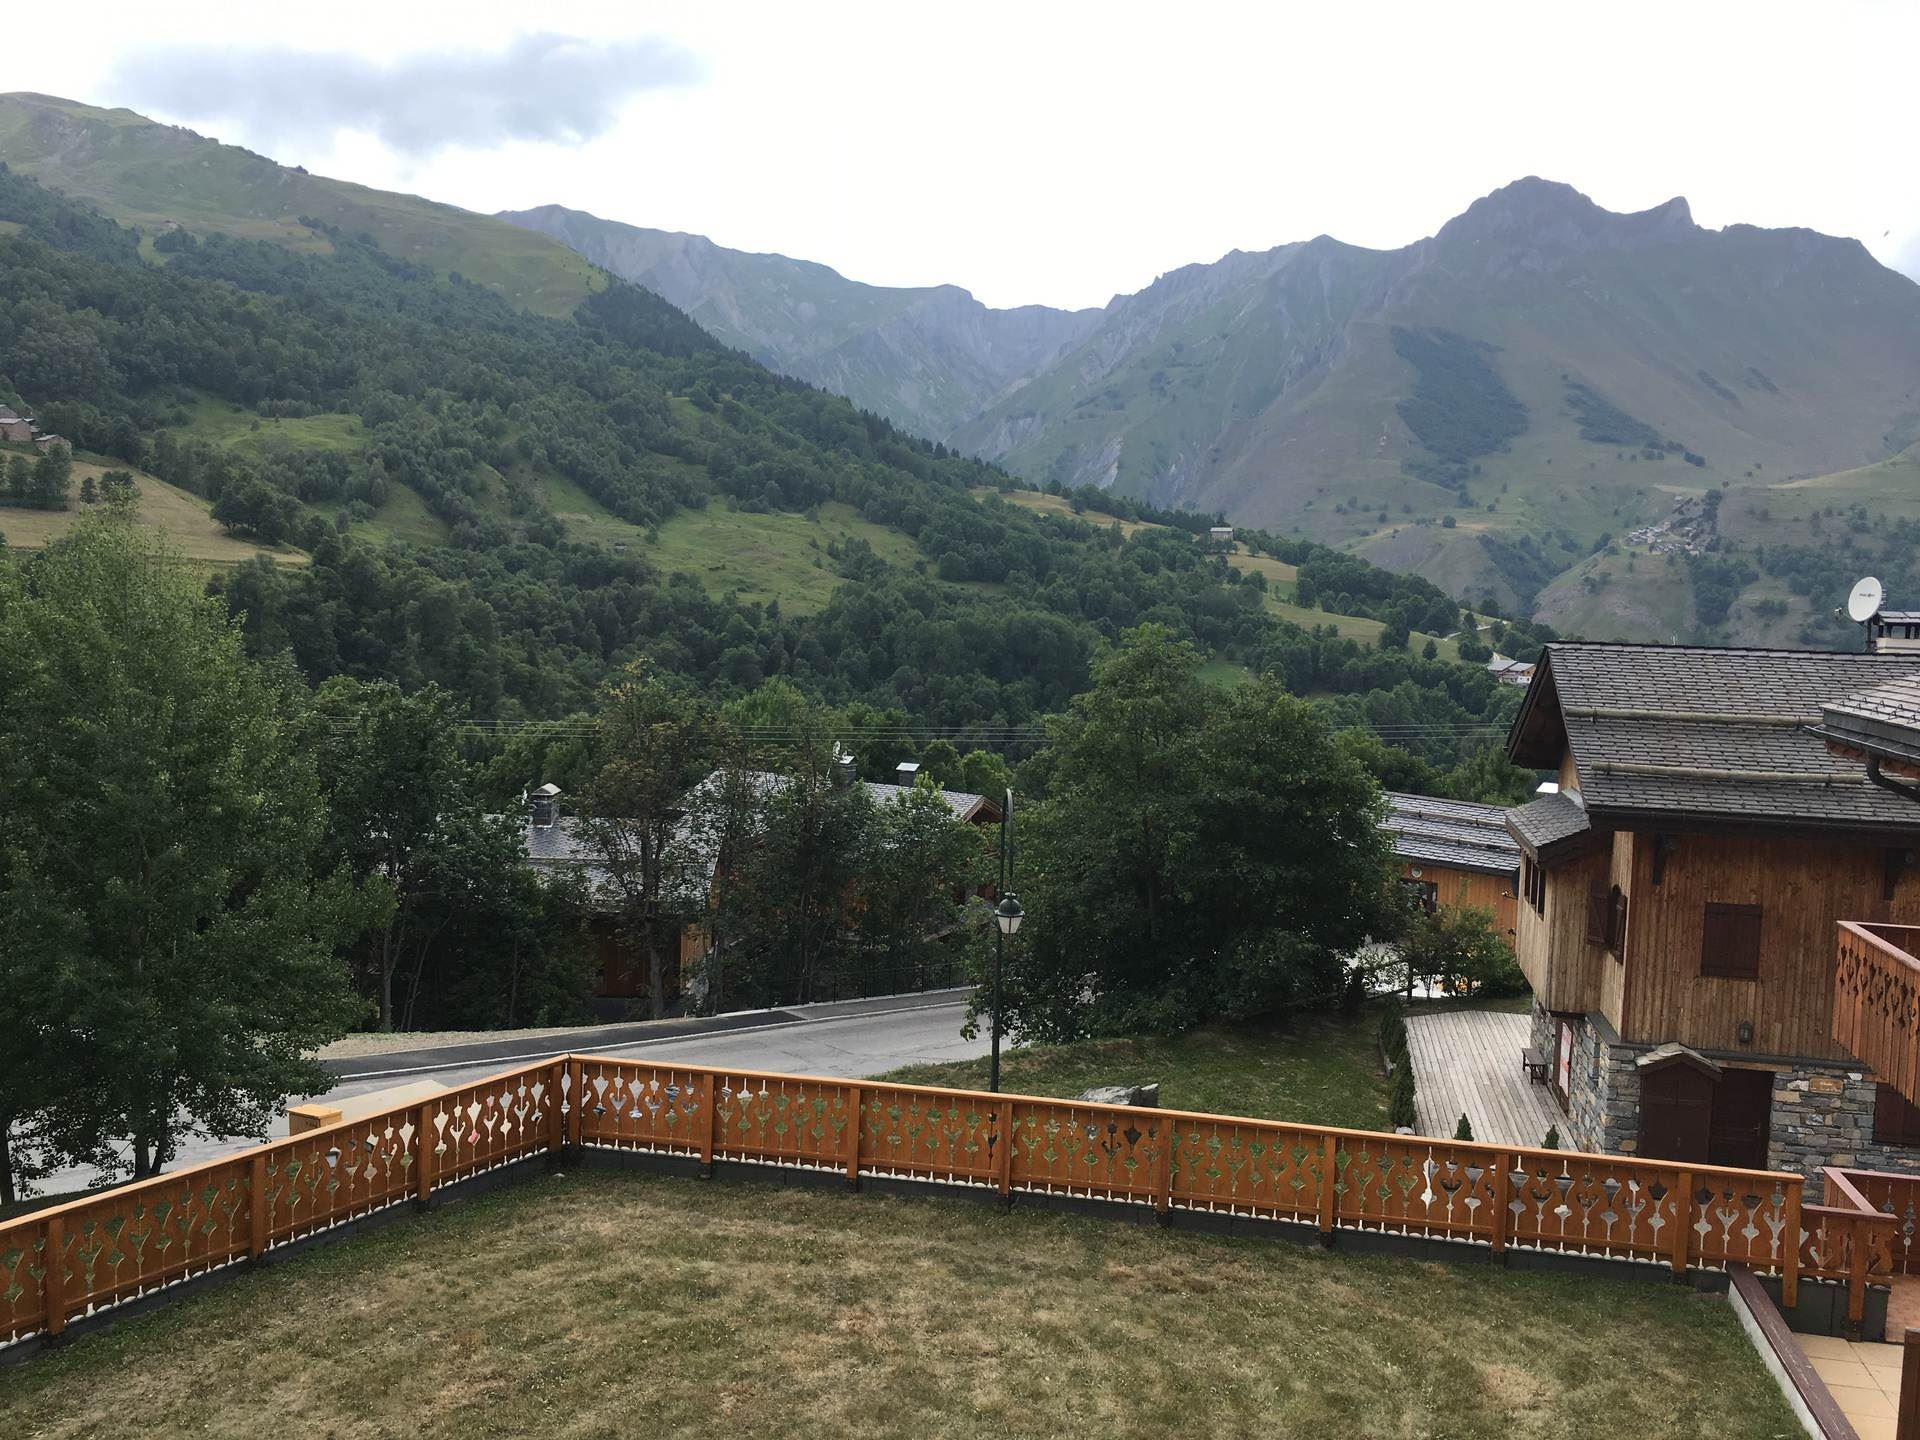 3 Rooms 6 Pers ski-in ski-out / ARMERIA 8